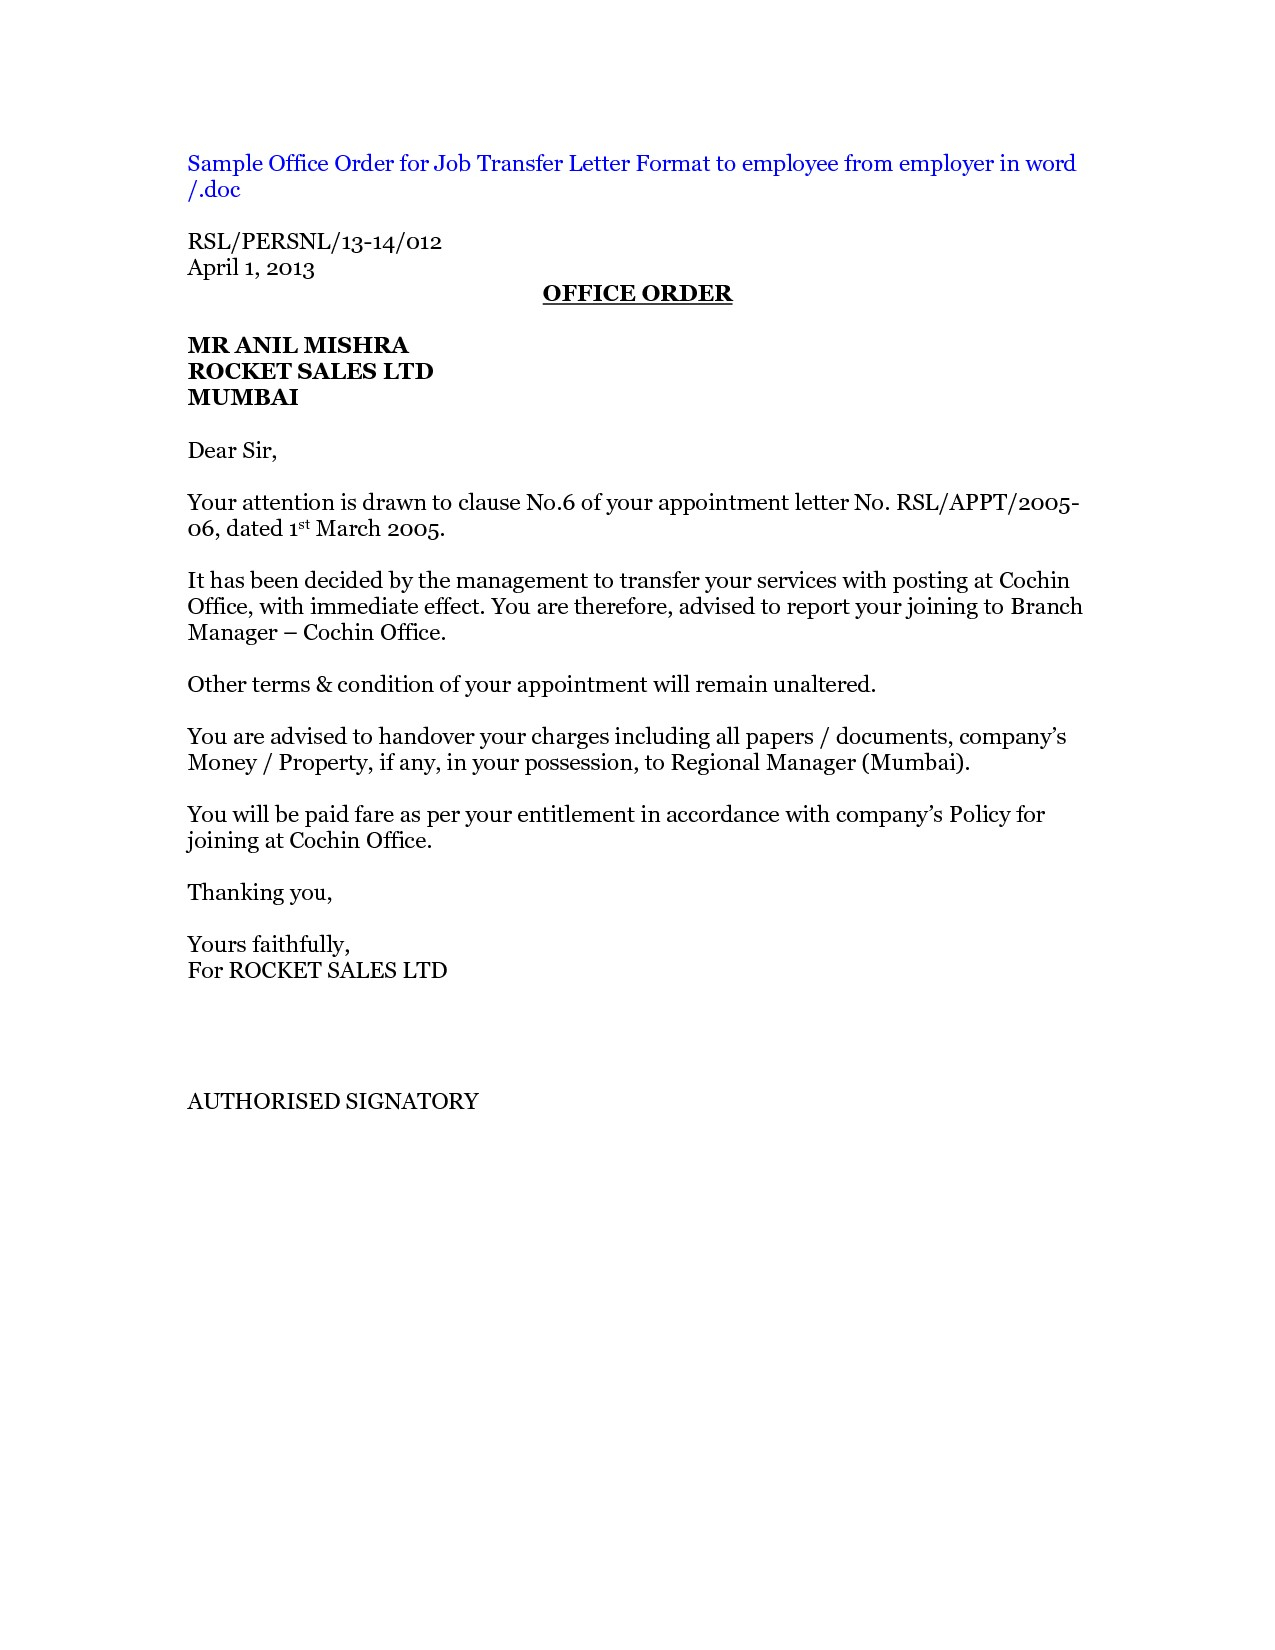 Transfer Letter Template - Application Letter for Transfer Job Location New Letter Intent